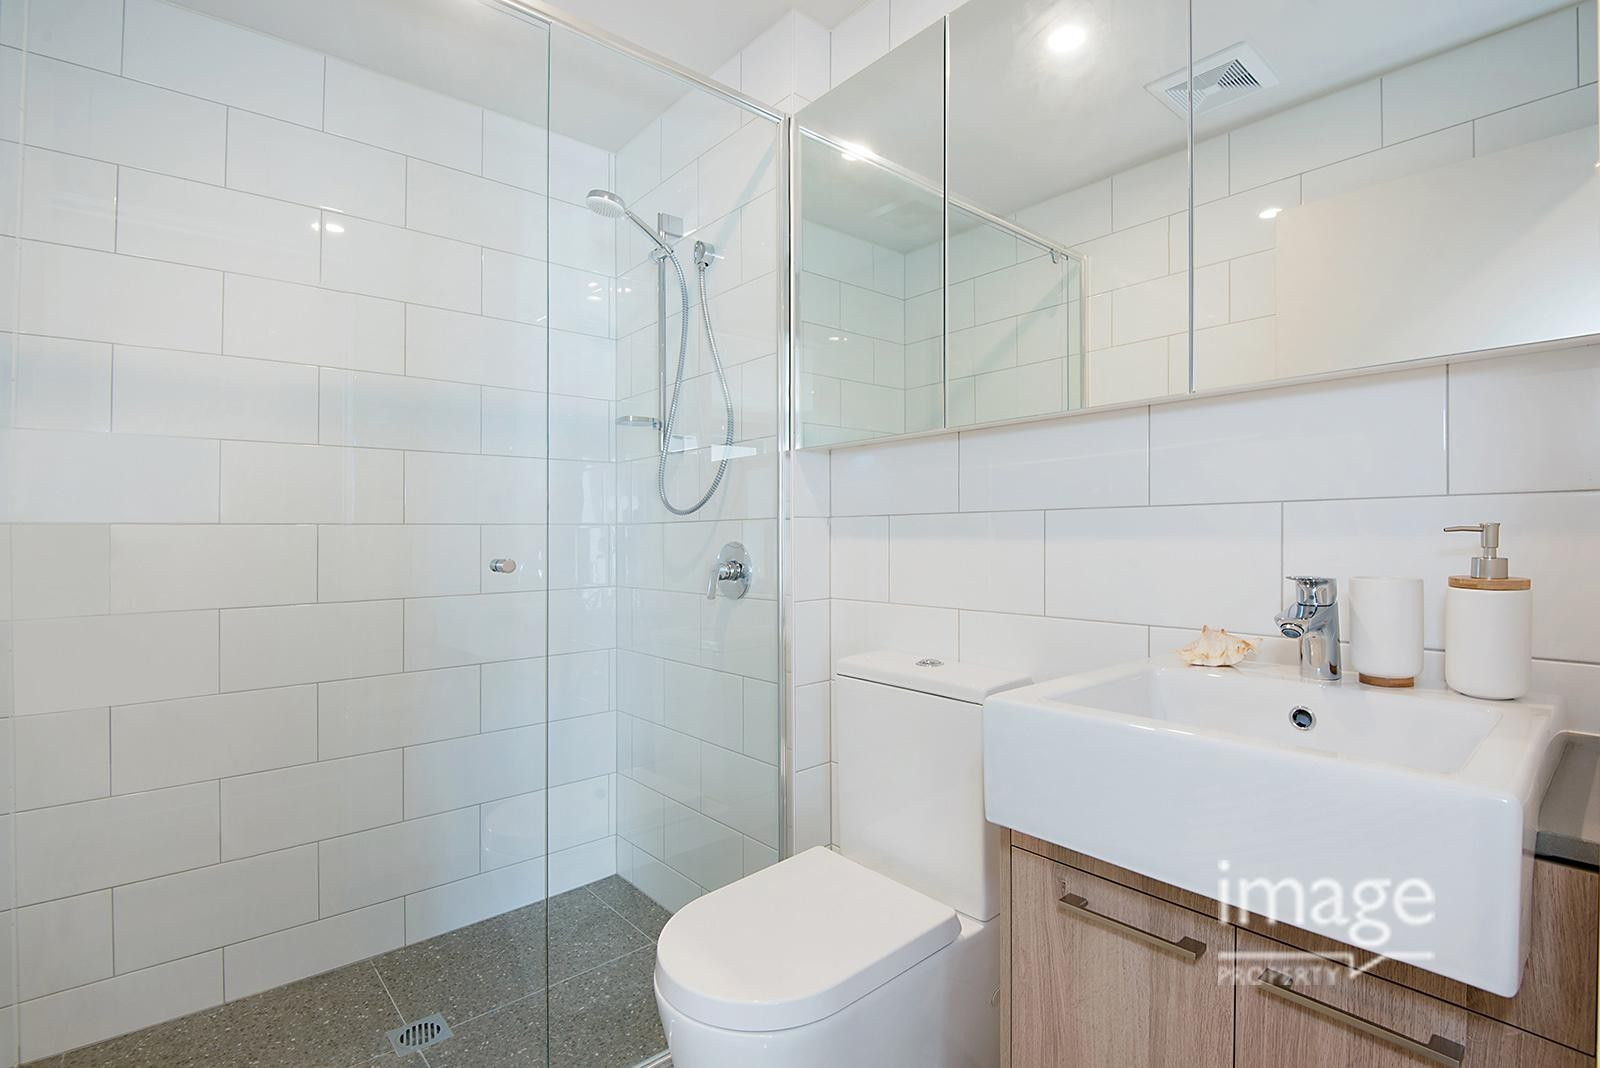 107/19 Haig Street, Coorparoo QLD 4151, Image 2